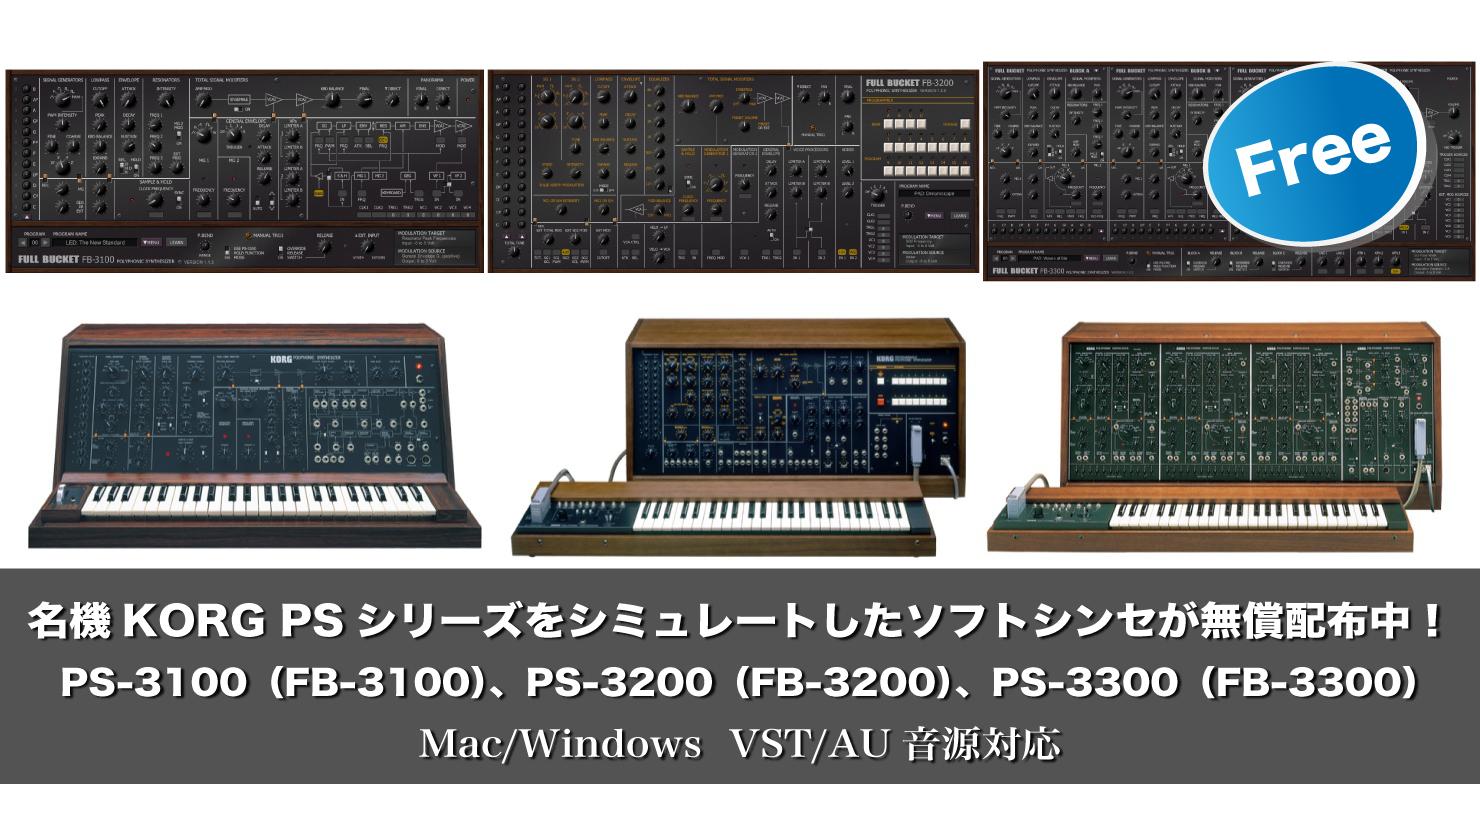 korg-PS-3100-3200-3300_free